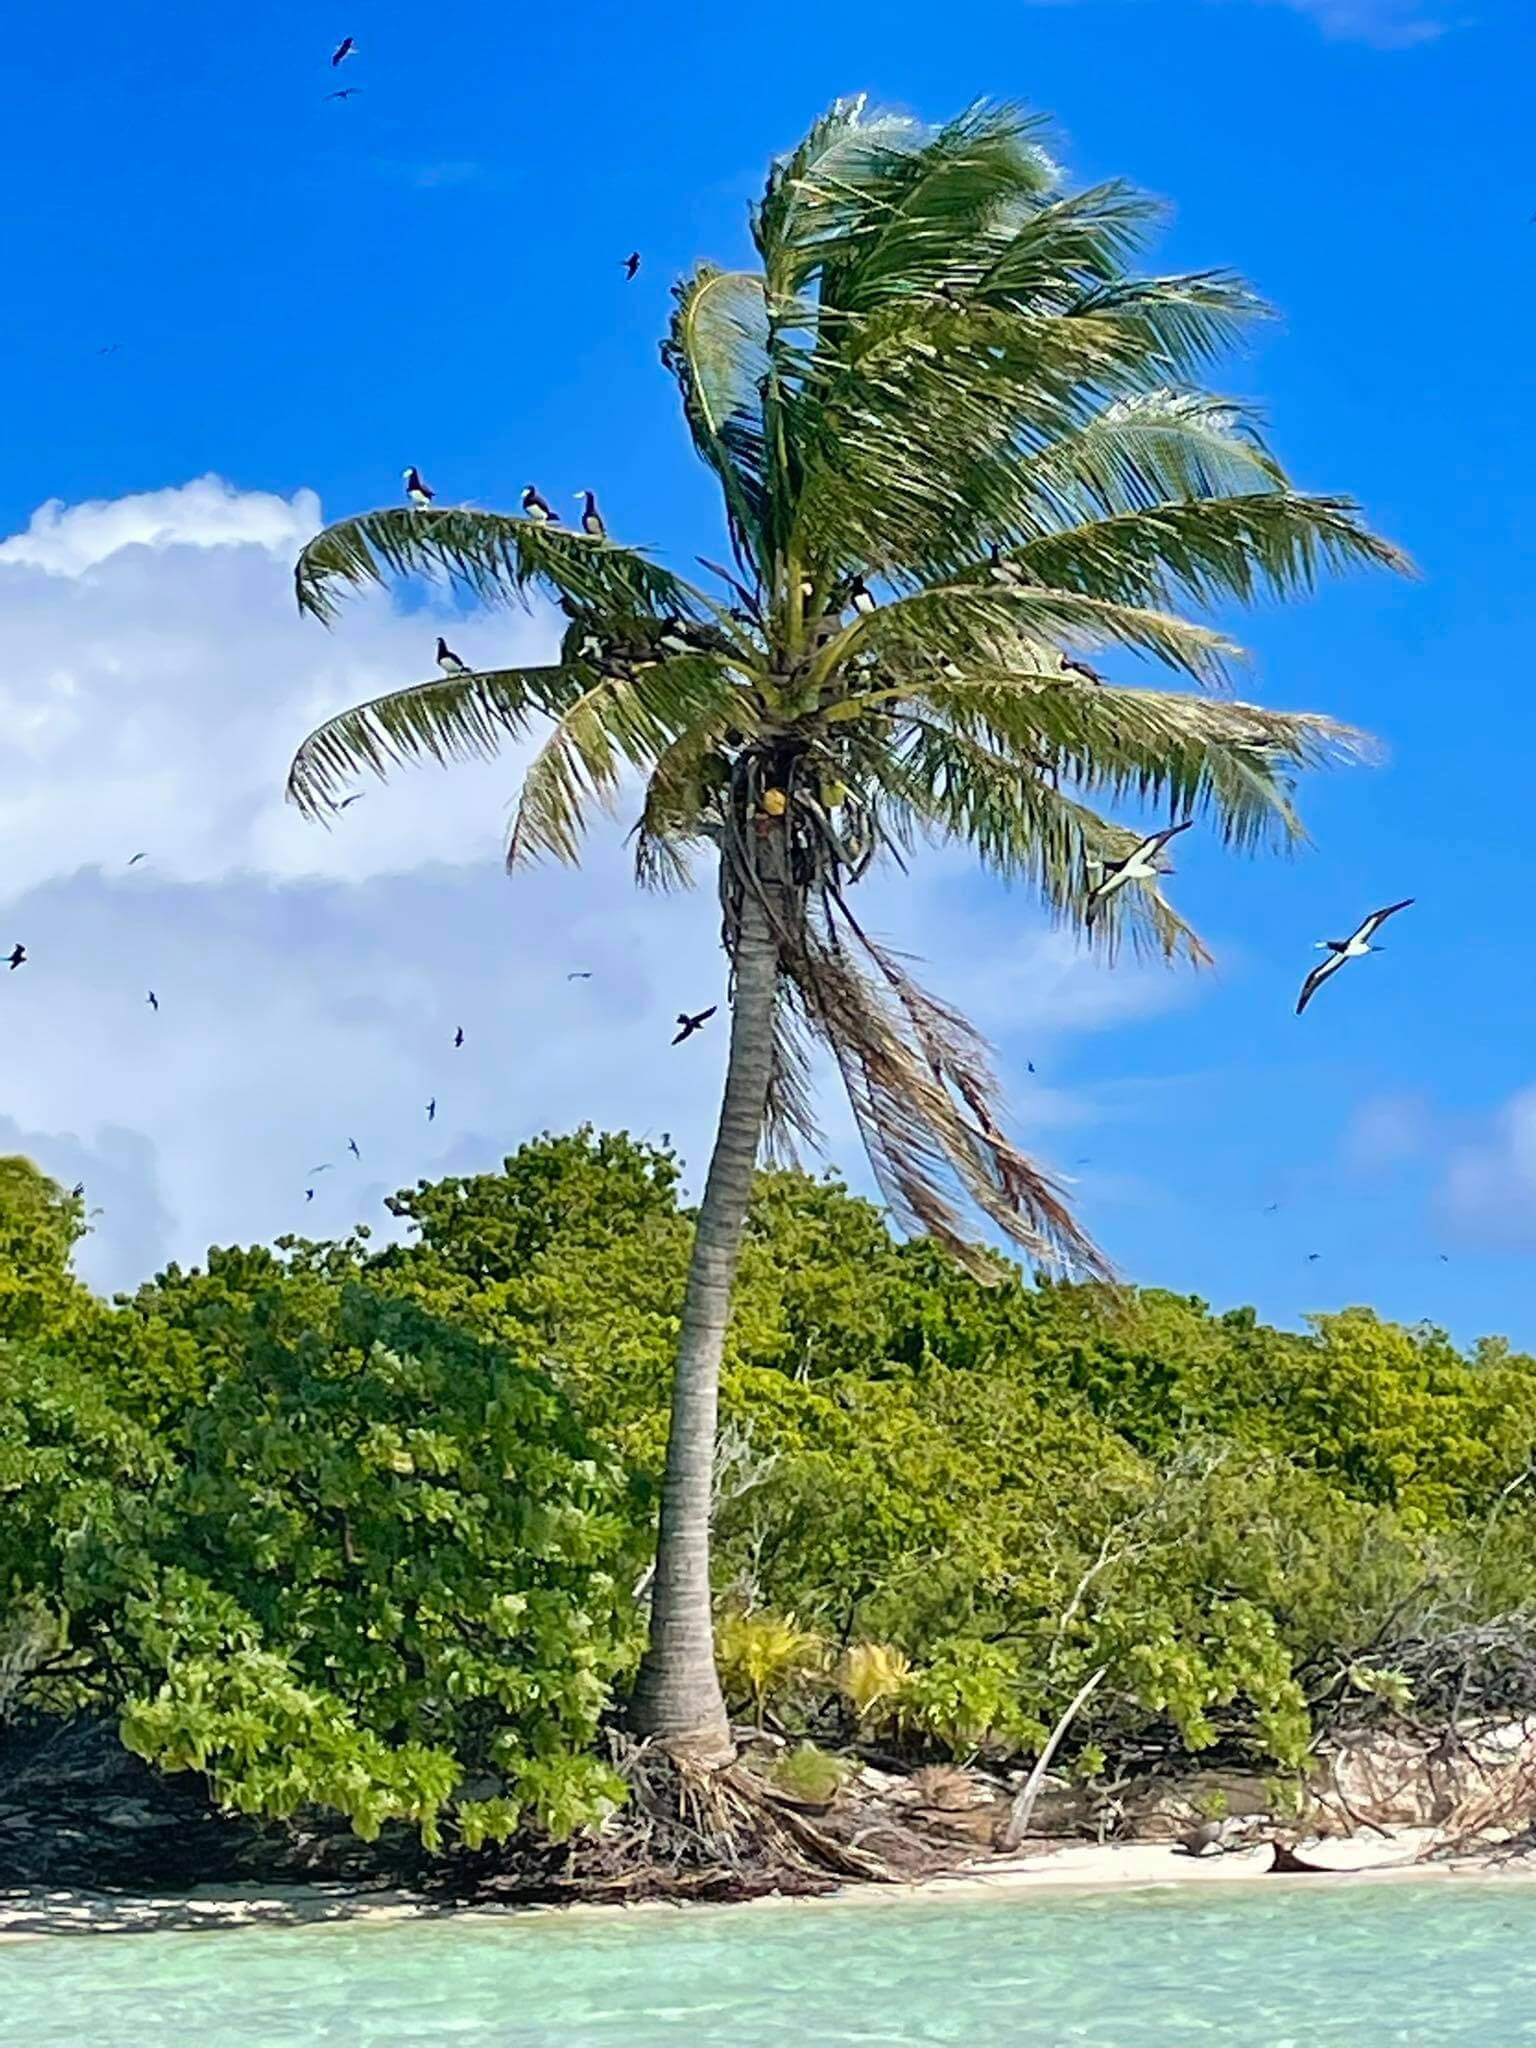 http://tahitivoileetlagon.com/wp-content/uploads/2021/07/arbre-aux-oiseaux-TETIAROA.jpg